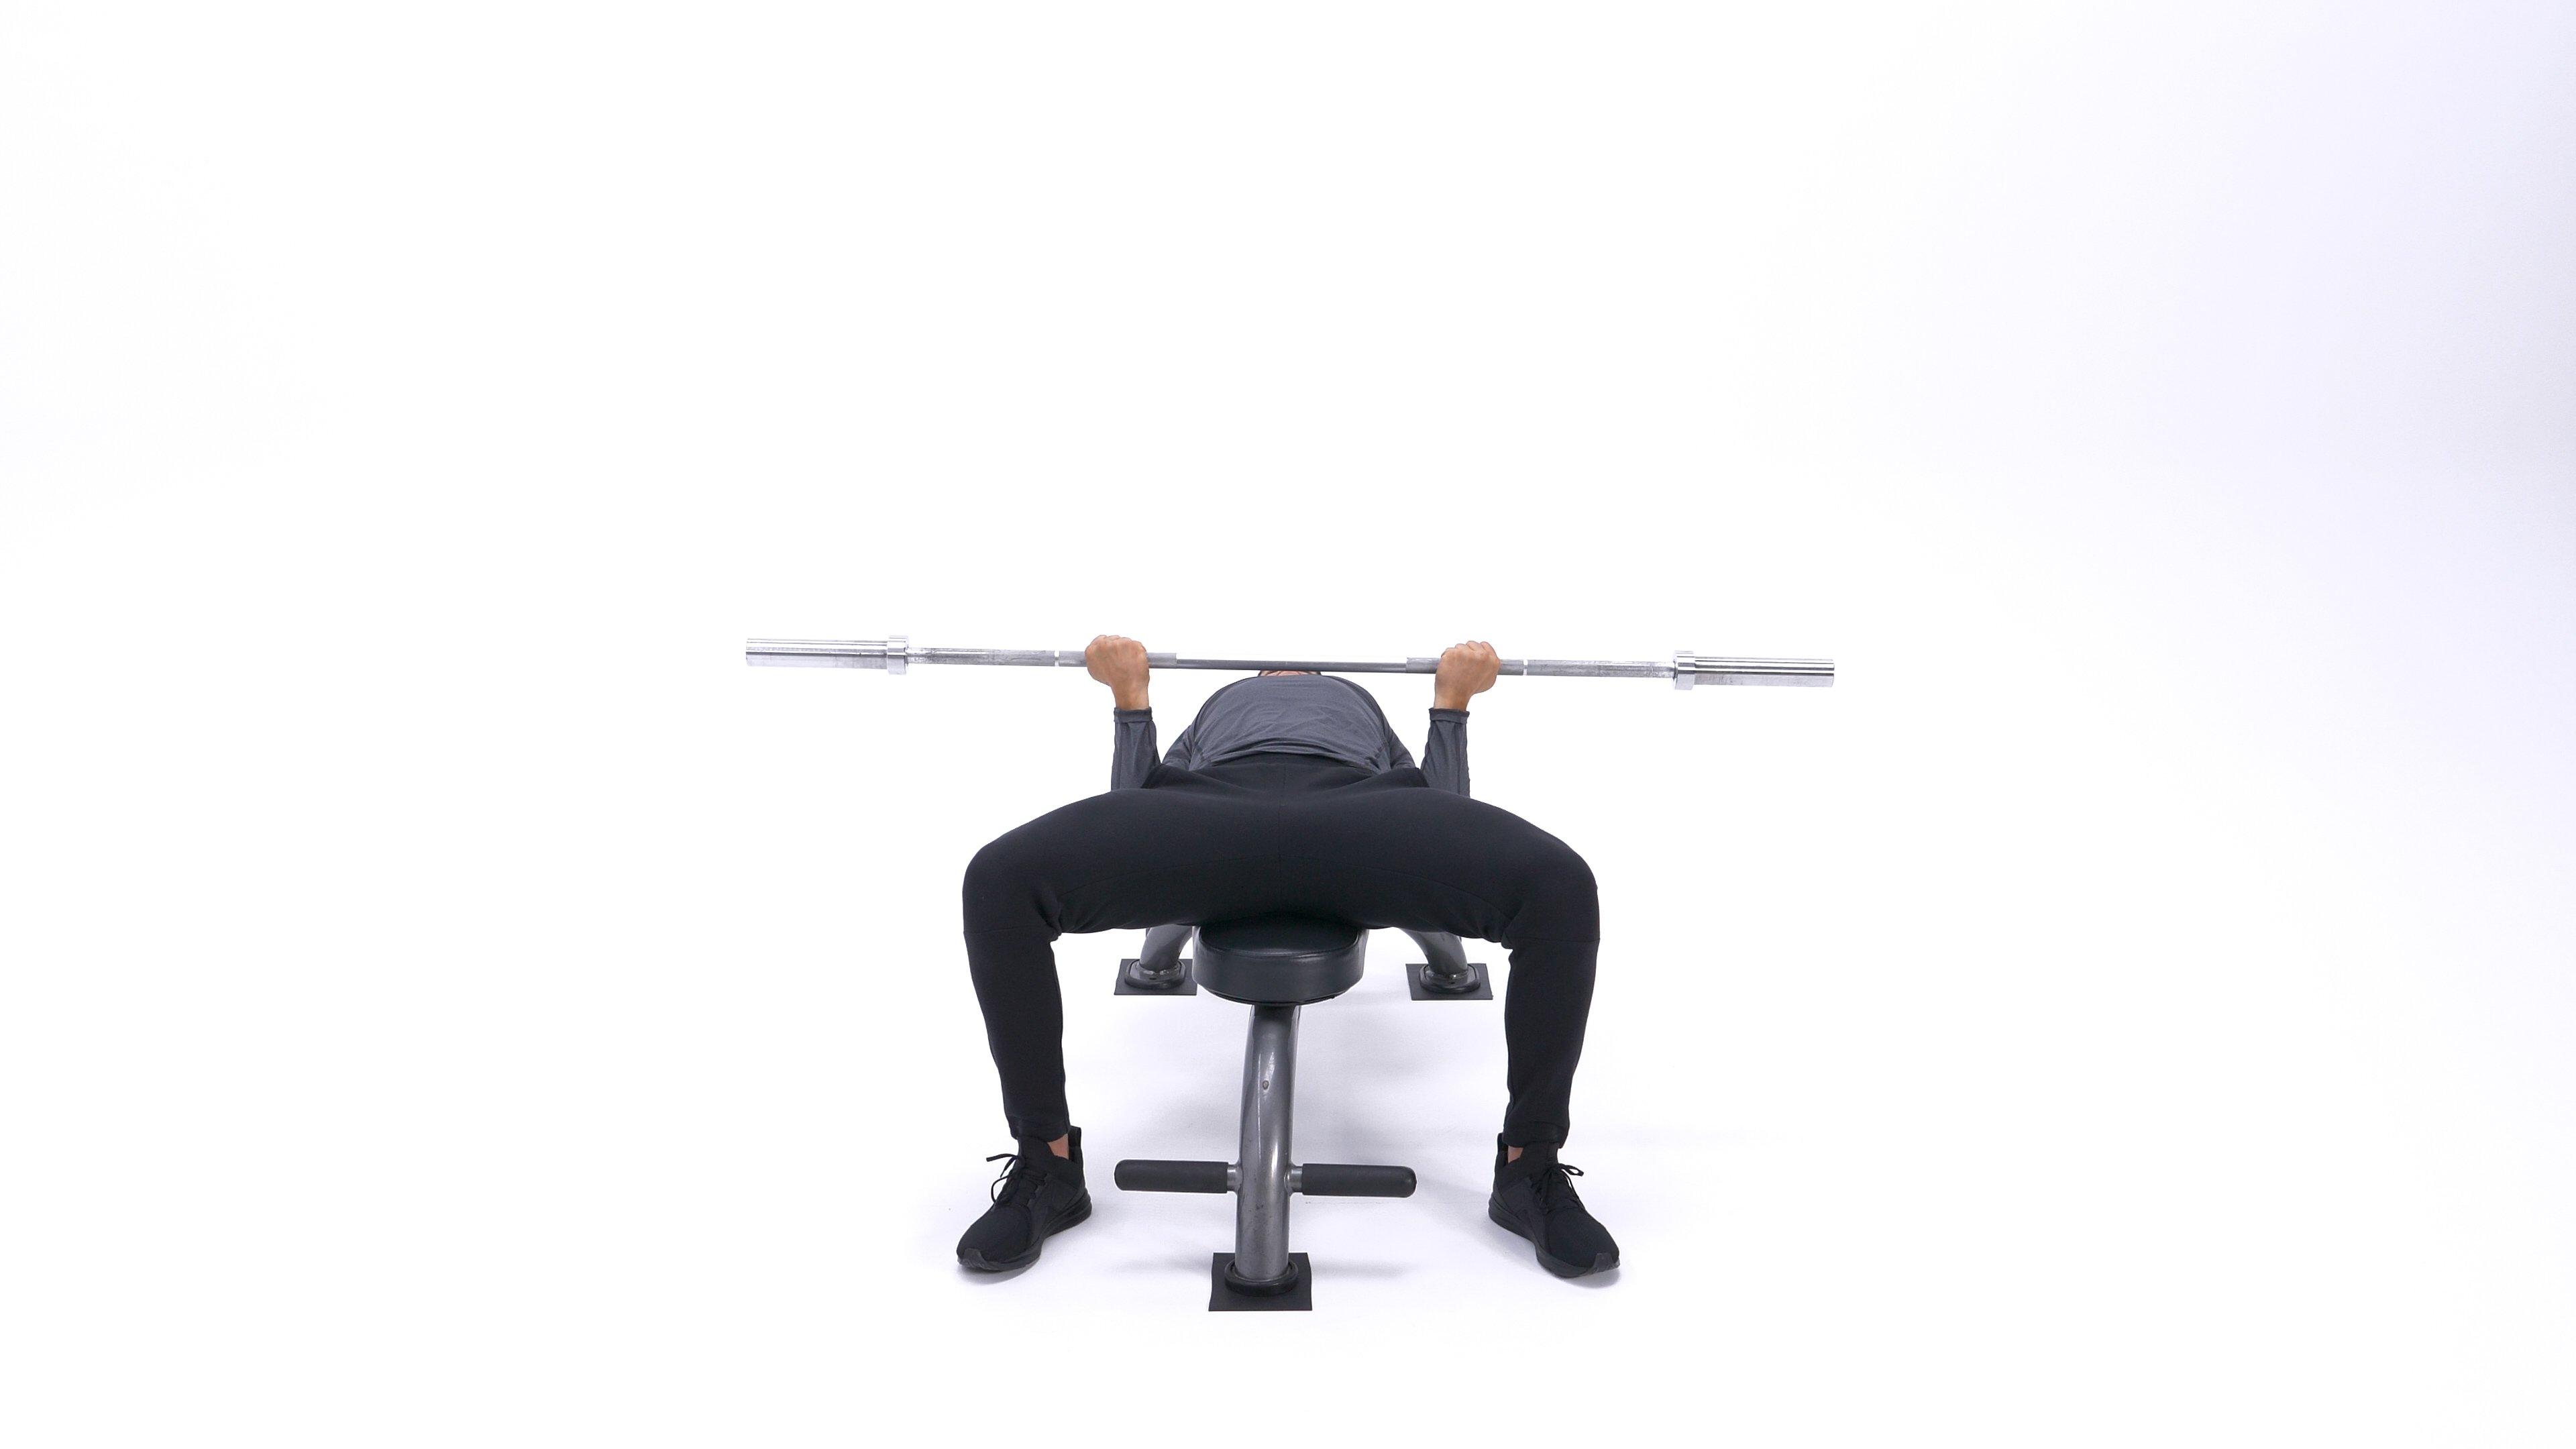 Reverse-grip bench press image